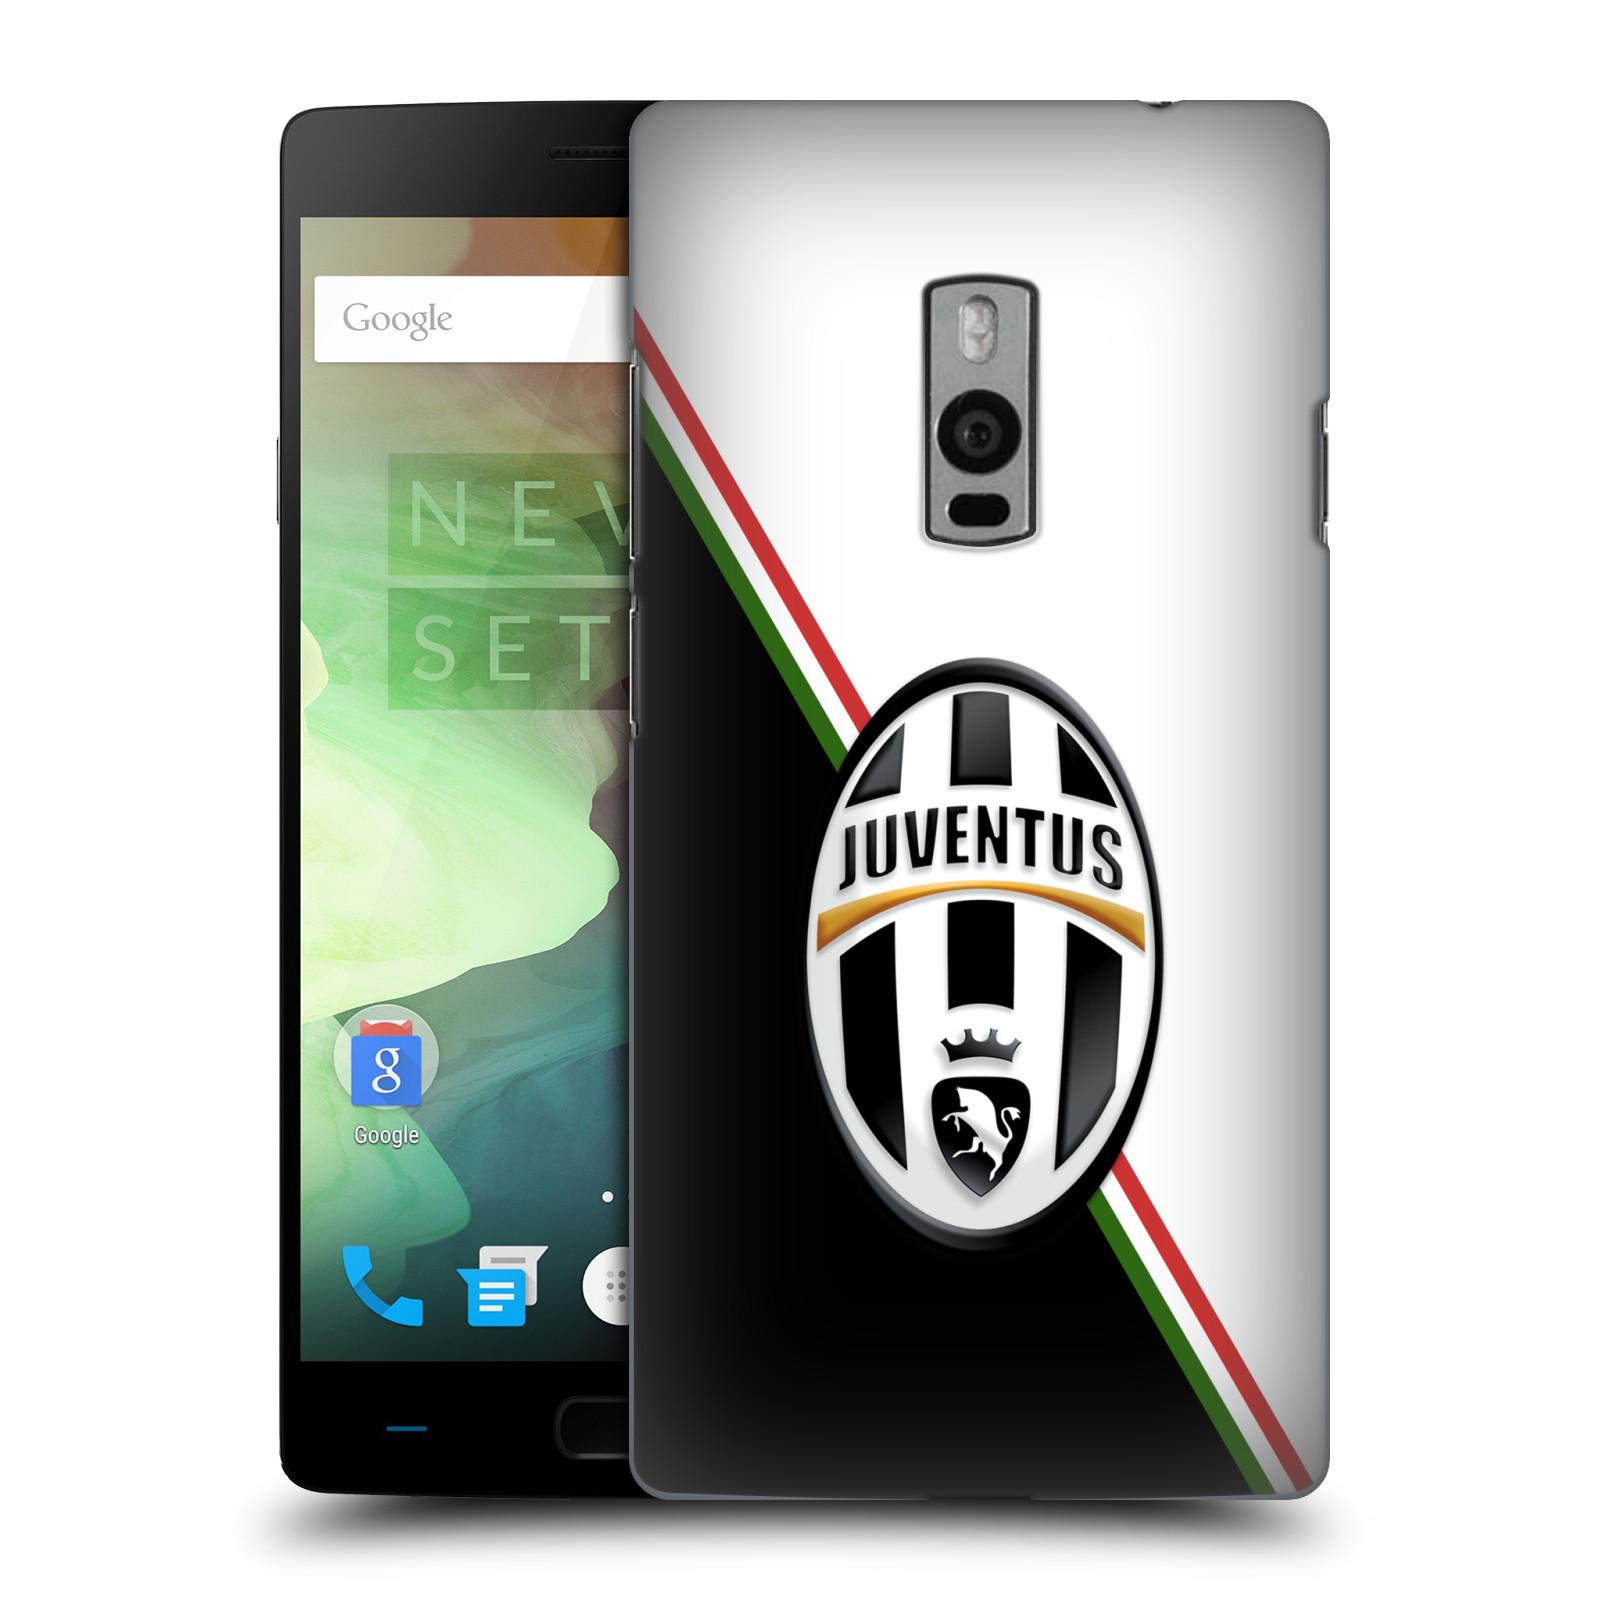 Plastové pouzdro na mobil OnePlus Two HEAD CASE Juventus FC - Black and White (Plastový kryt či obal na mobilní telefon Juventus FC Official pro OnePlus Two)